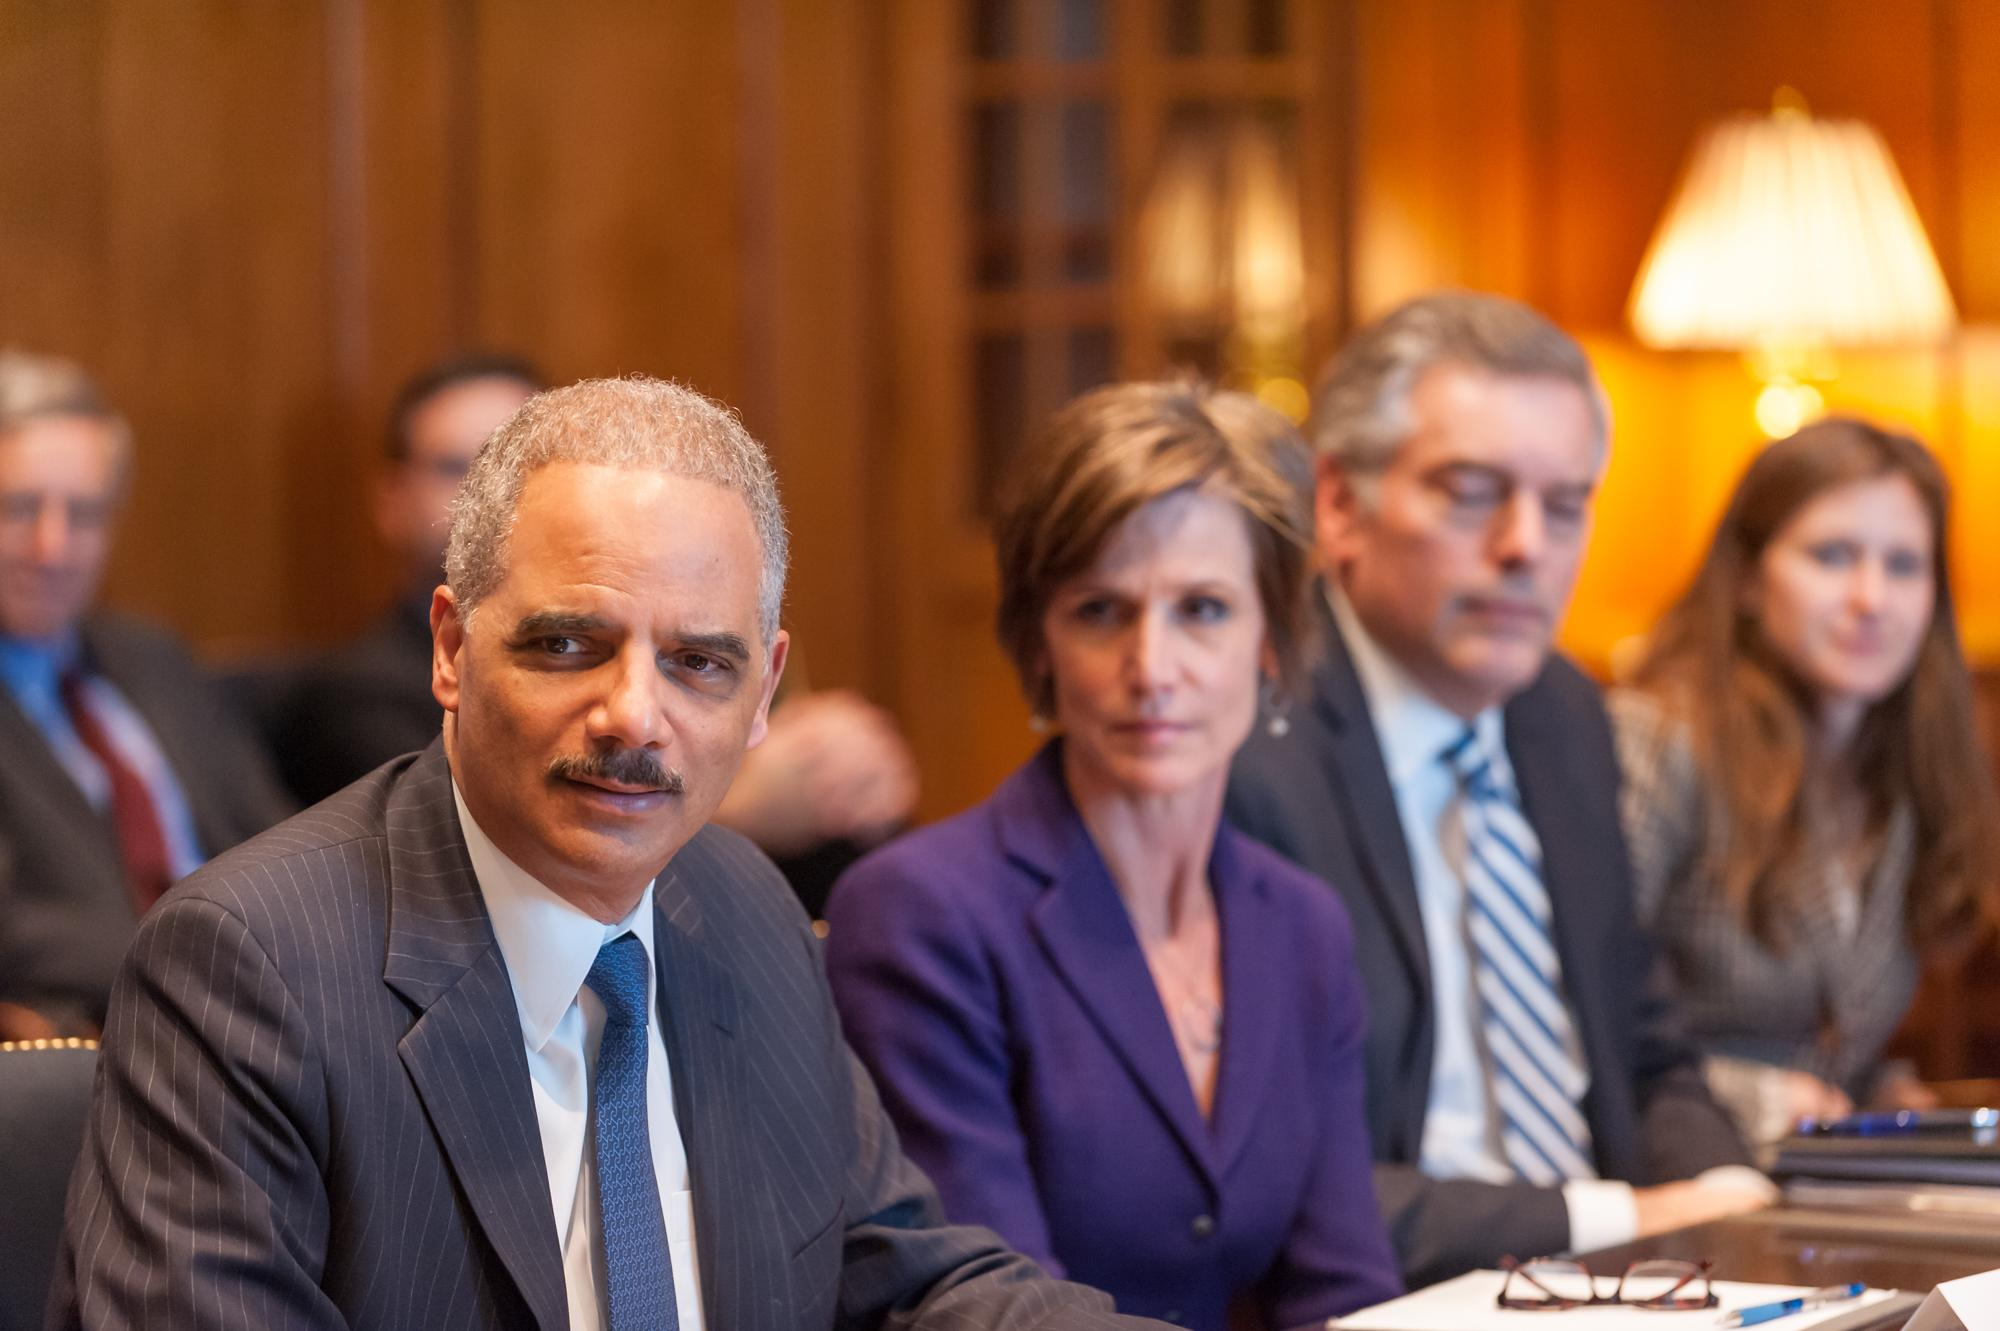 Eric Holder and Sally Yates